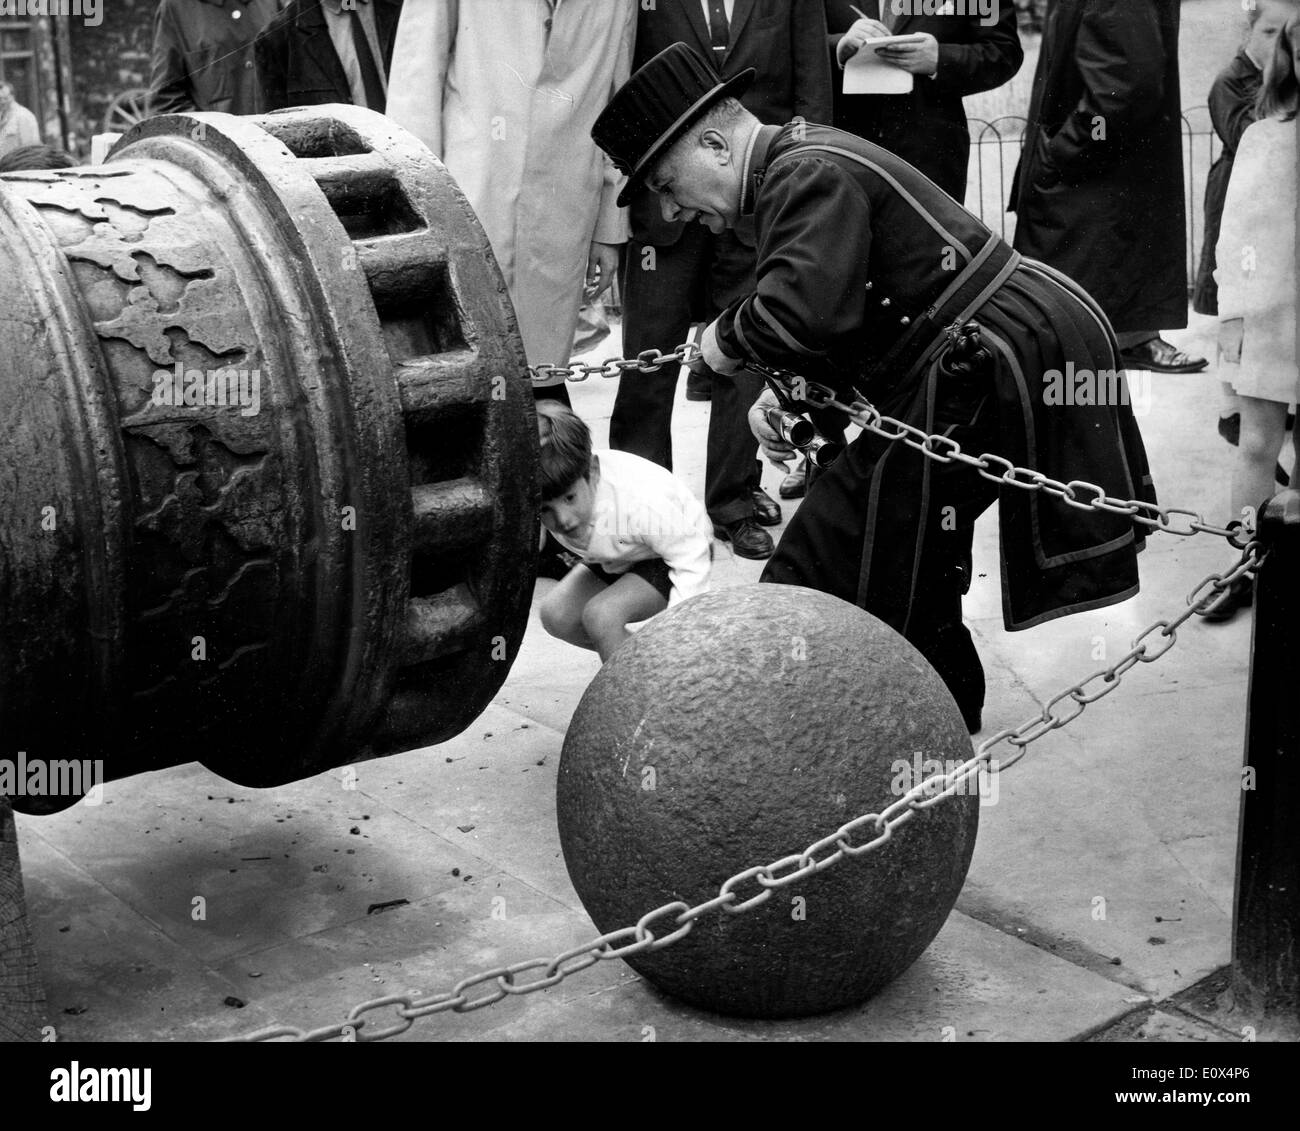 John Kennedy Jr. playing at Tower of London - Stock Image